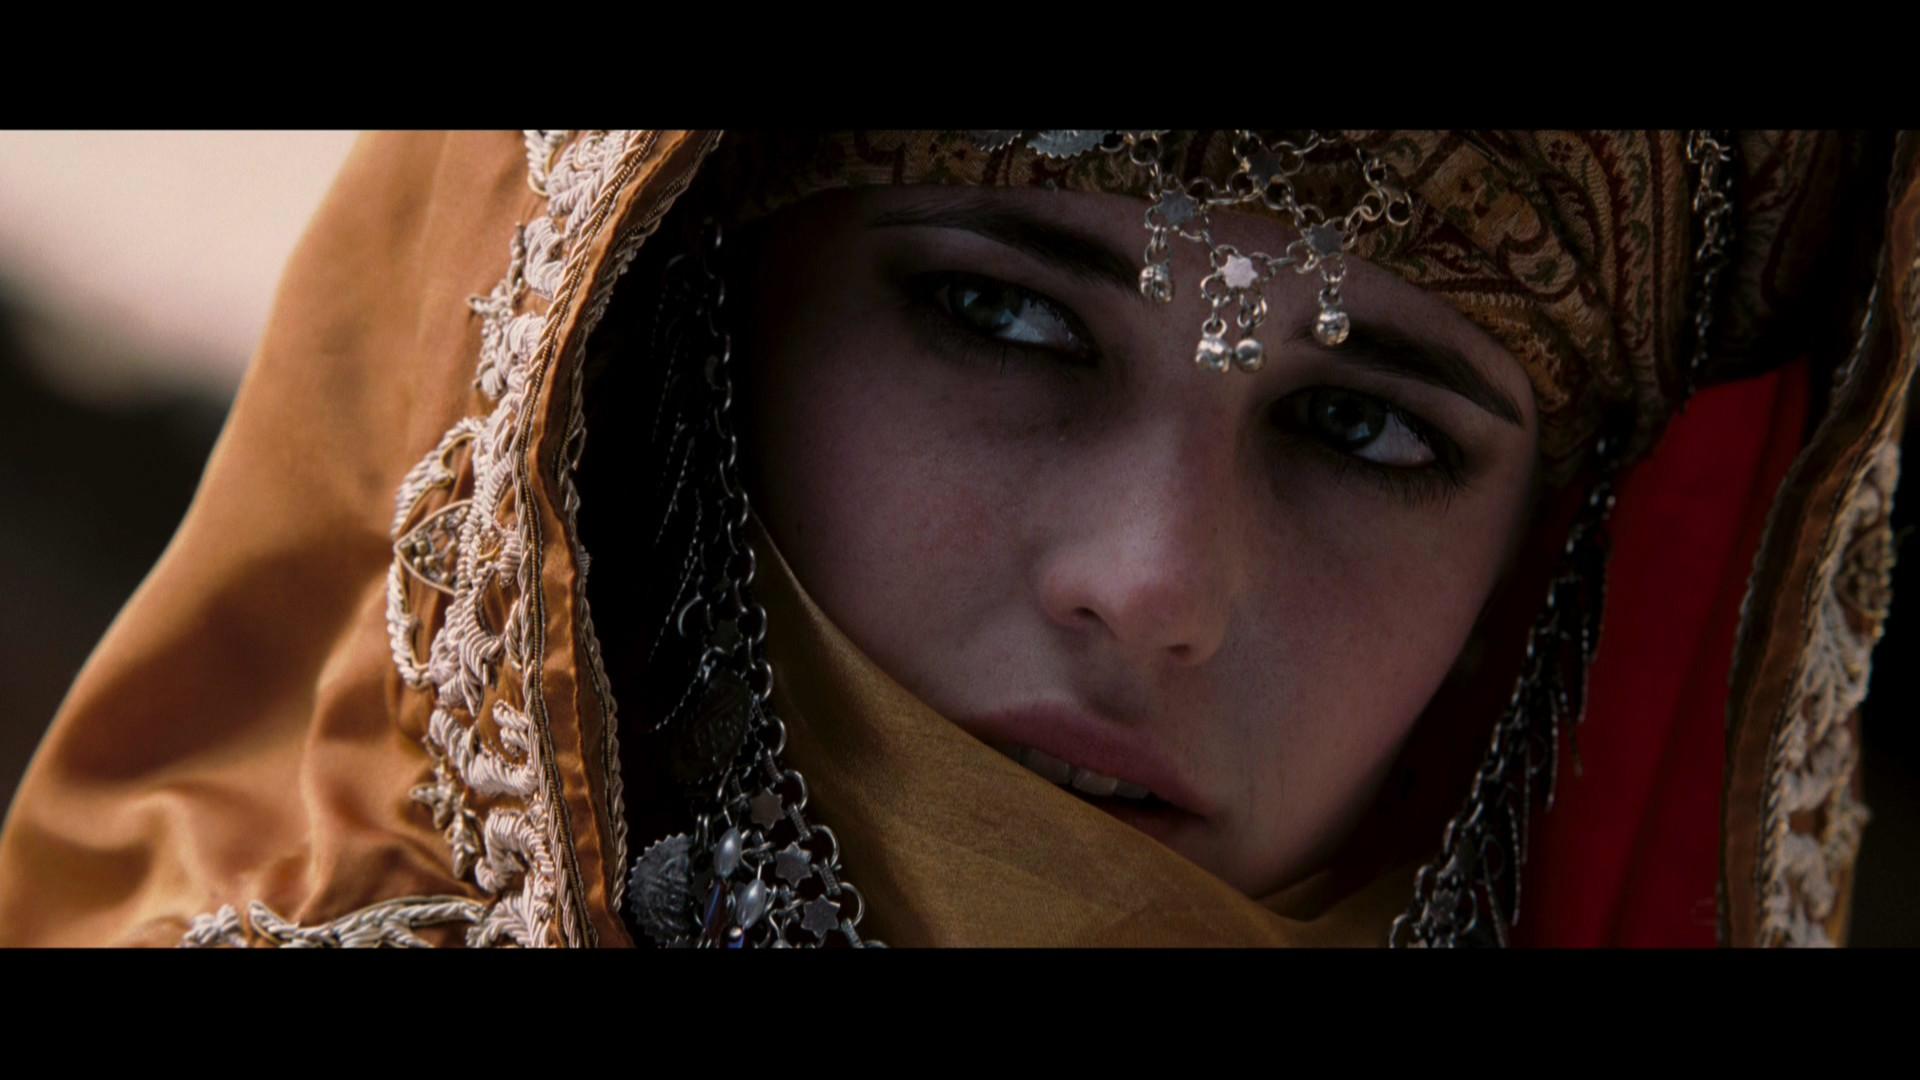 … Kingdom of Heaven: Director's Cut …